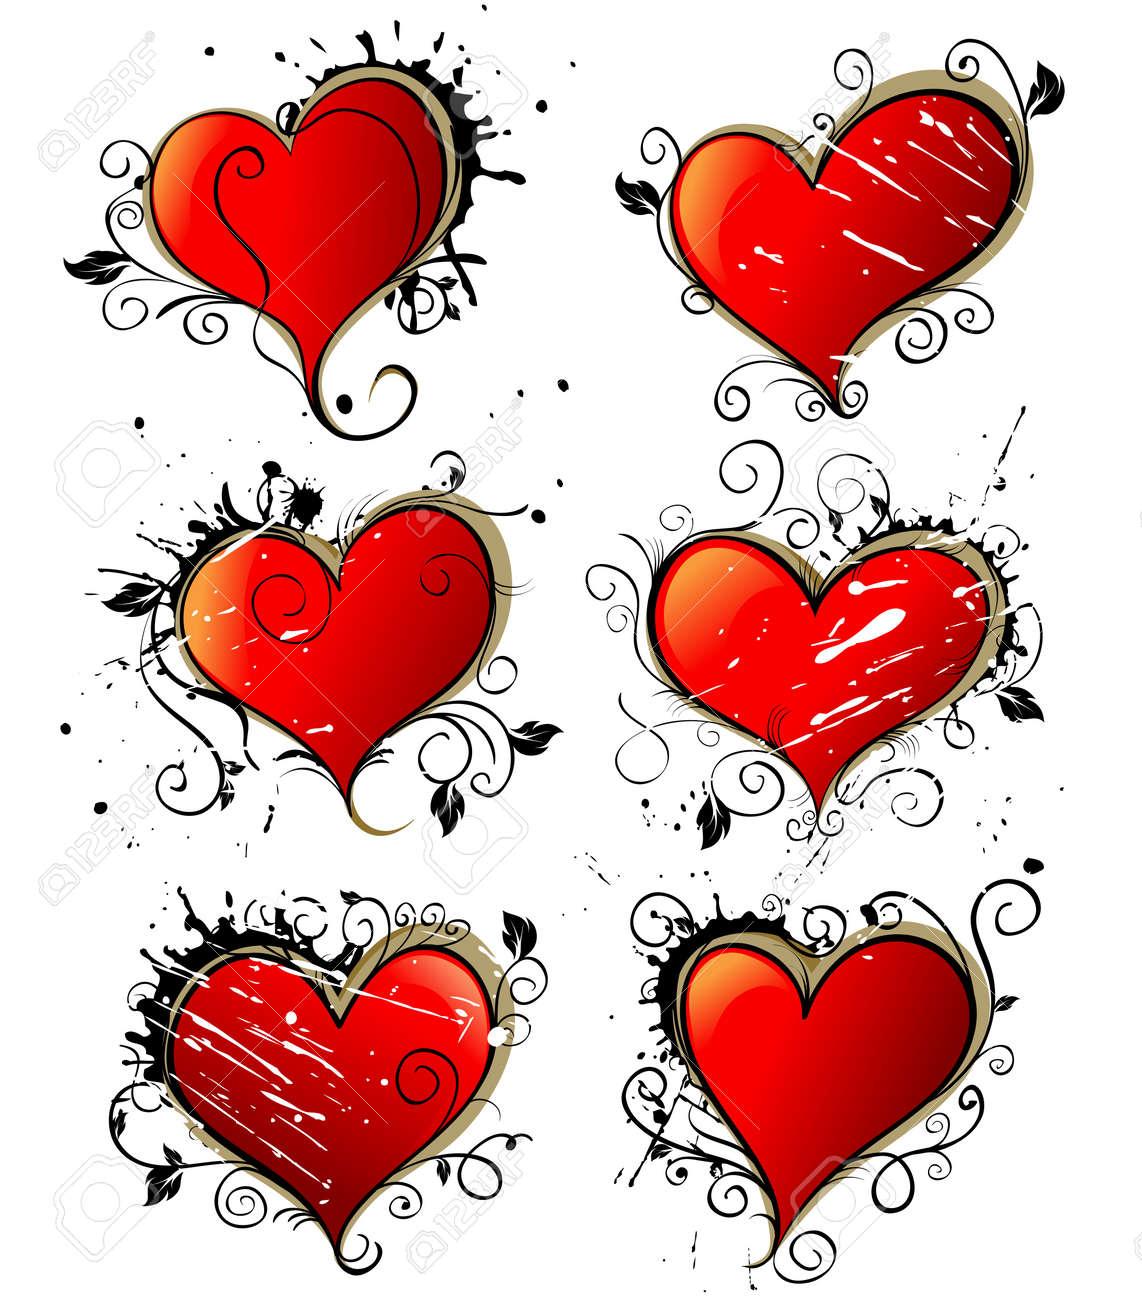 Hearts Love Vector Grunge Decoration Graffiti Style